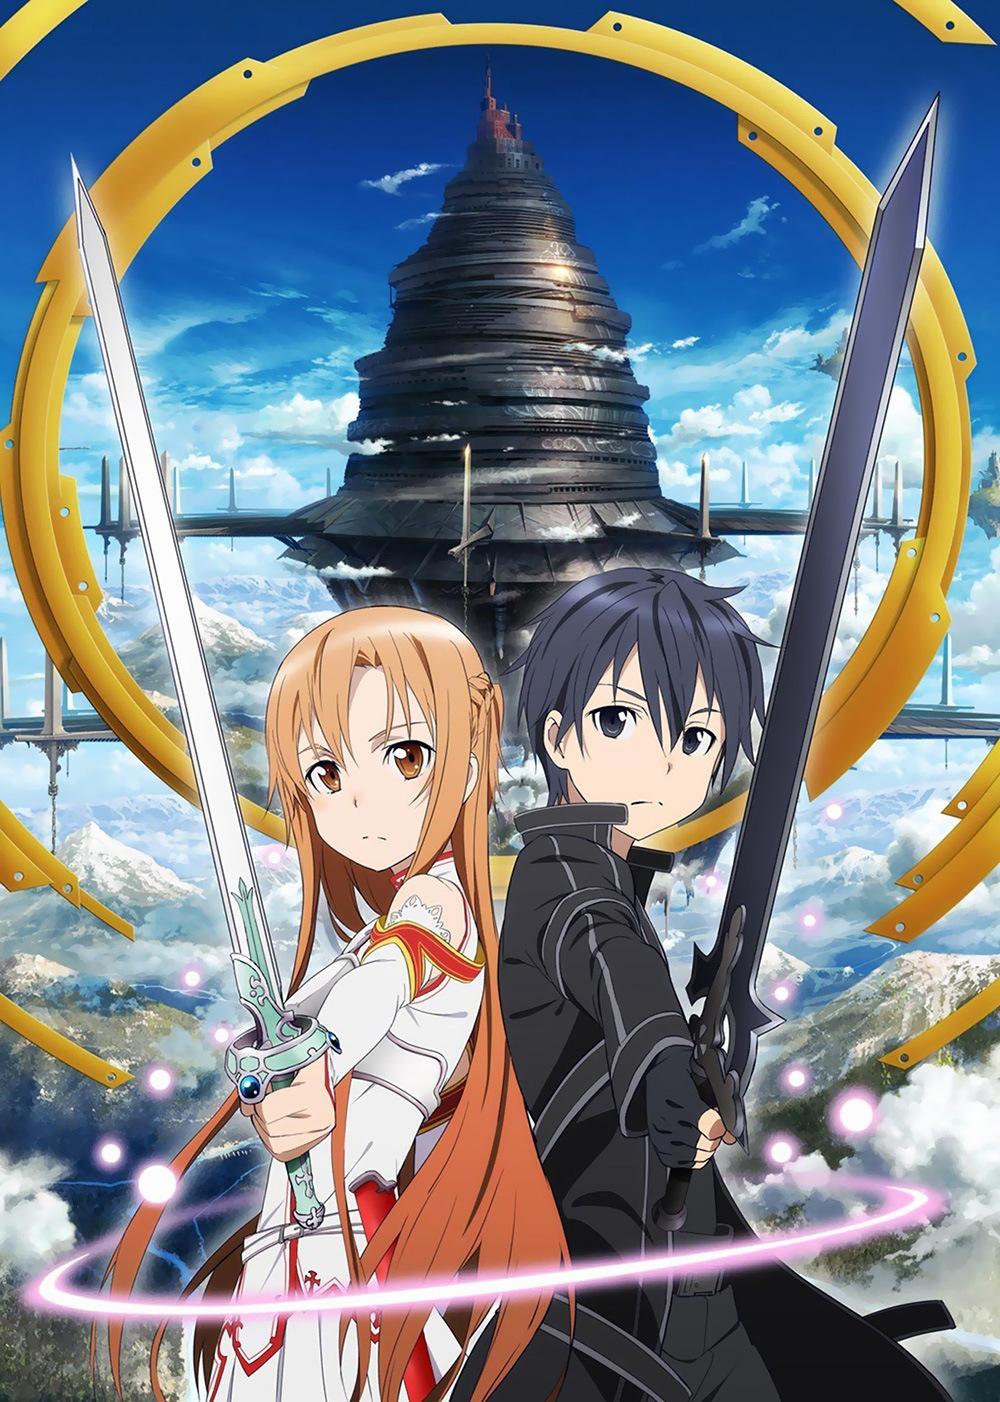 Sword-Art-Online-Anime-Visual